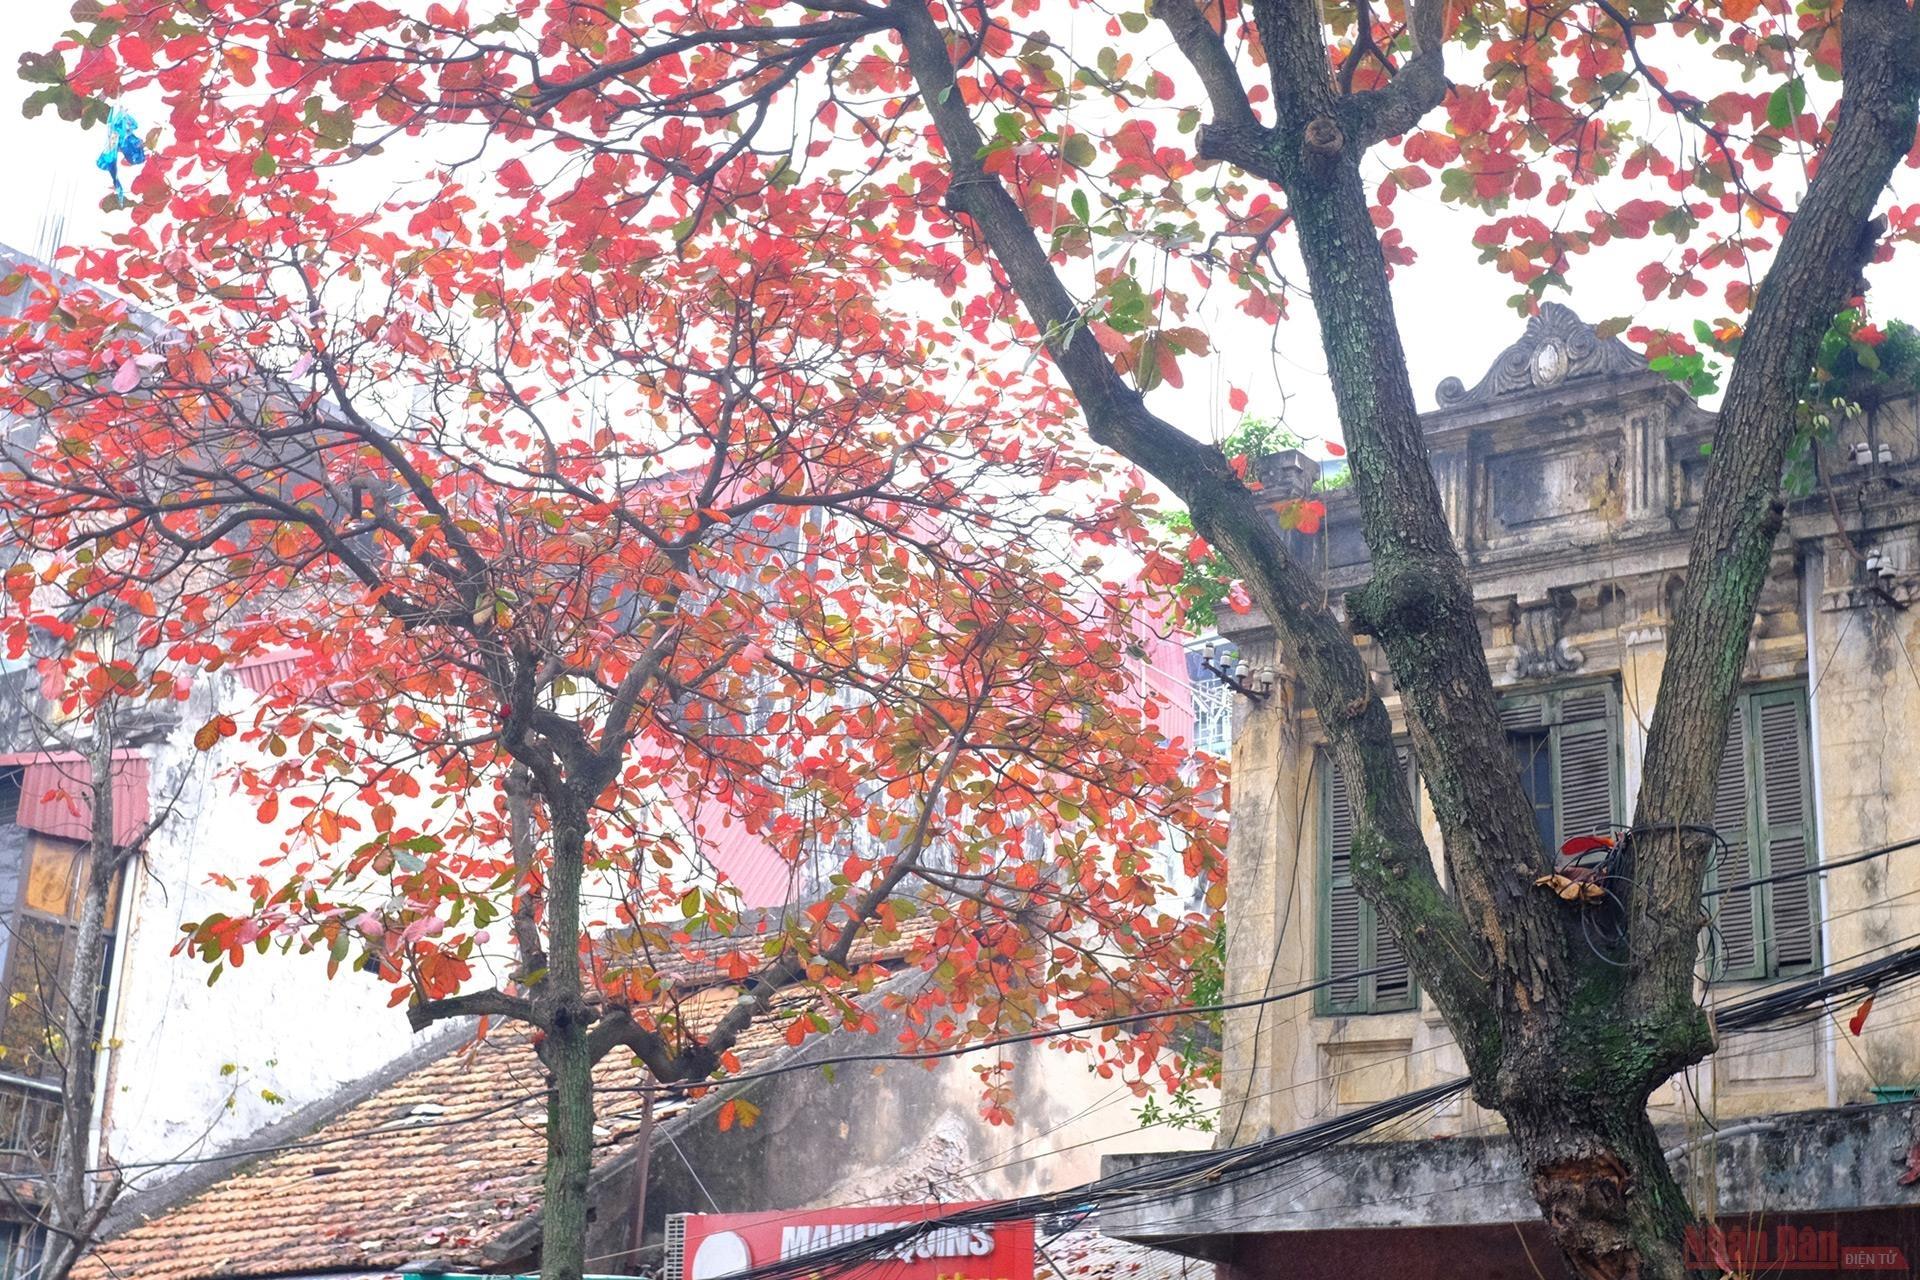 Brilliant Hanoi in leaf-changing season of 'bang' trees